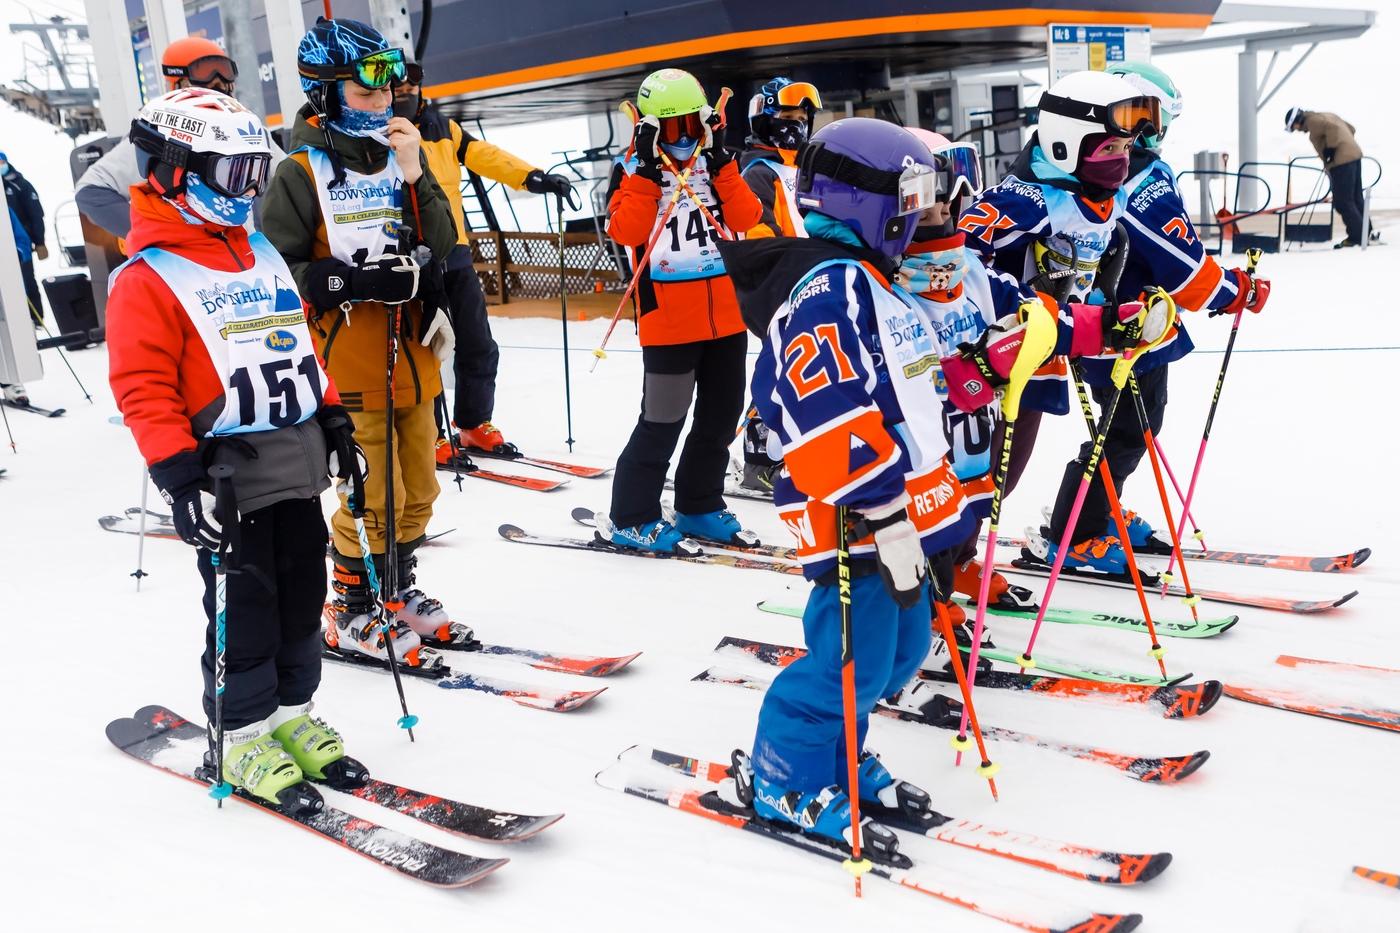 WinterKids Downhill 24 2021 SDP 2714